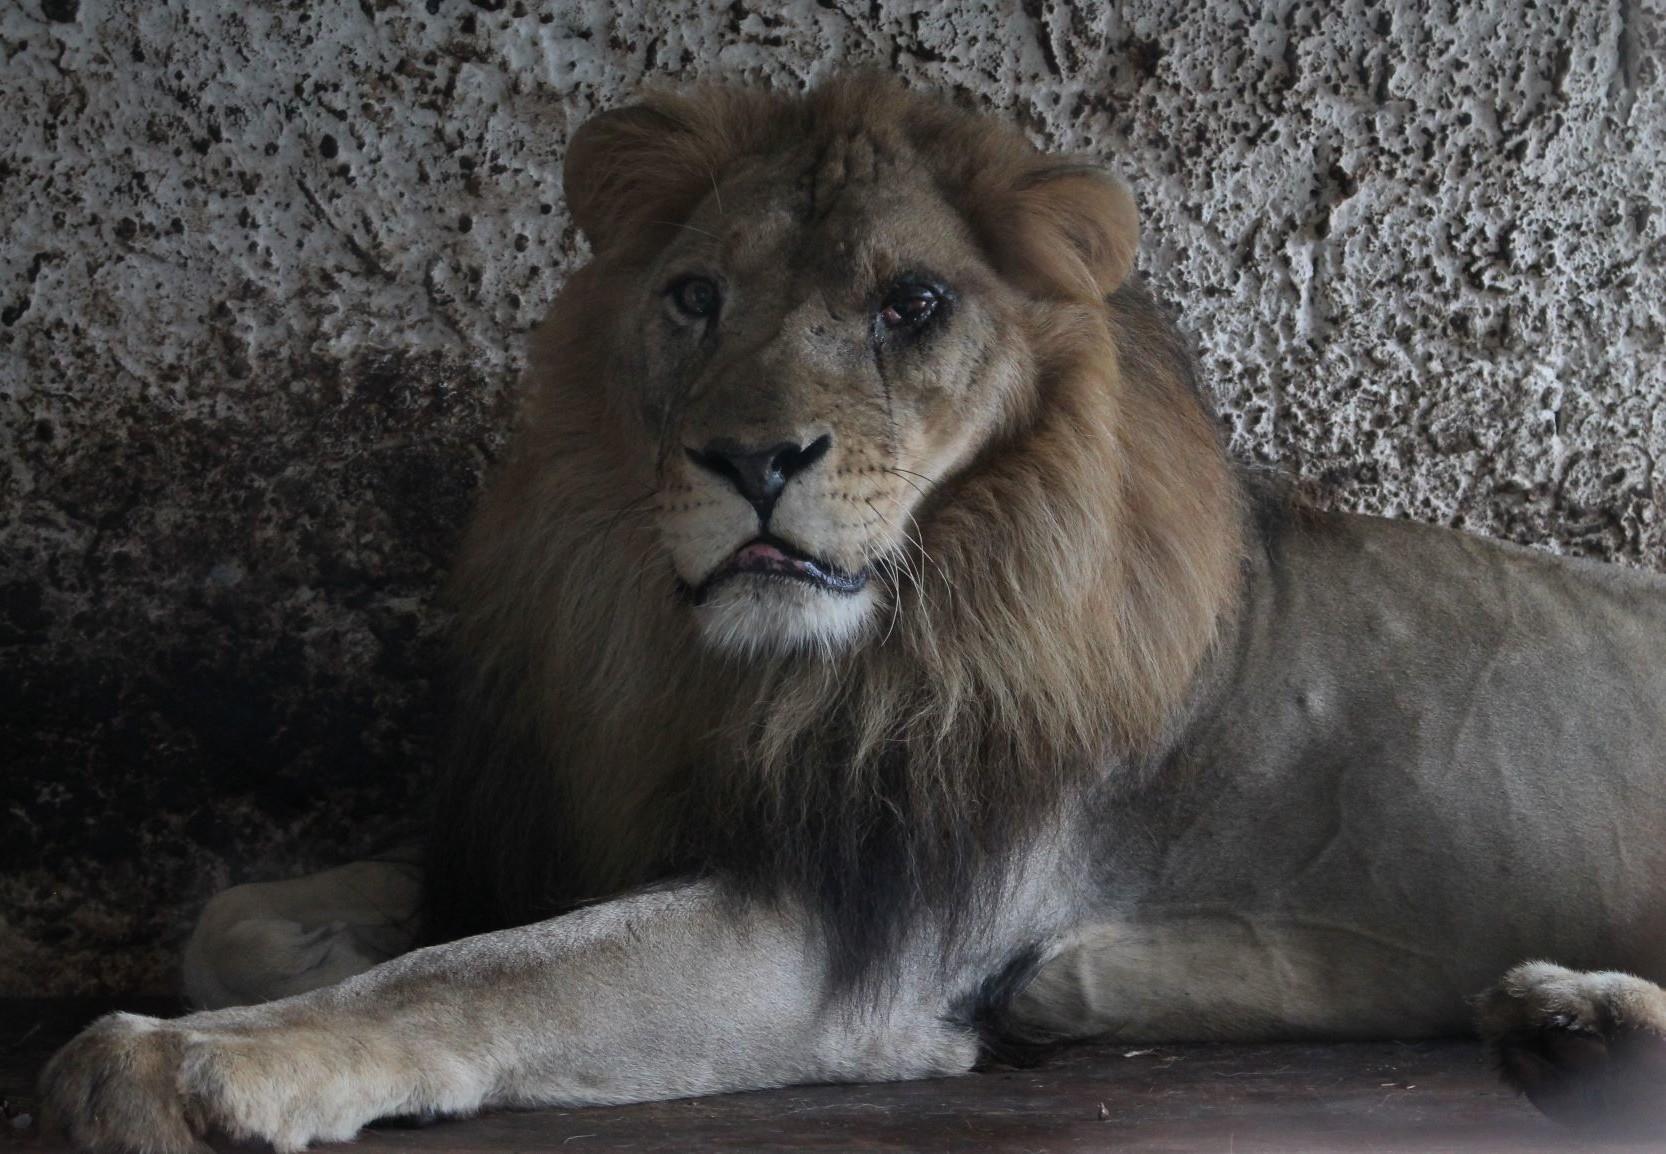 No More Fier Zoo (c) VIER PFOTEN